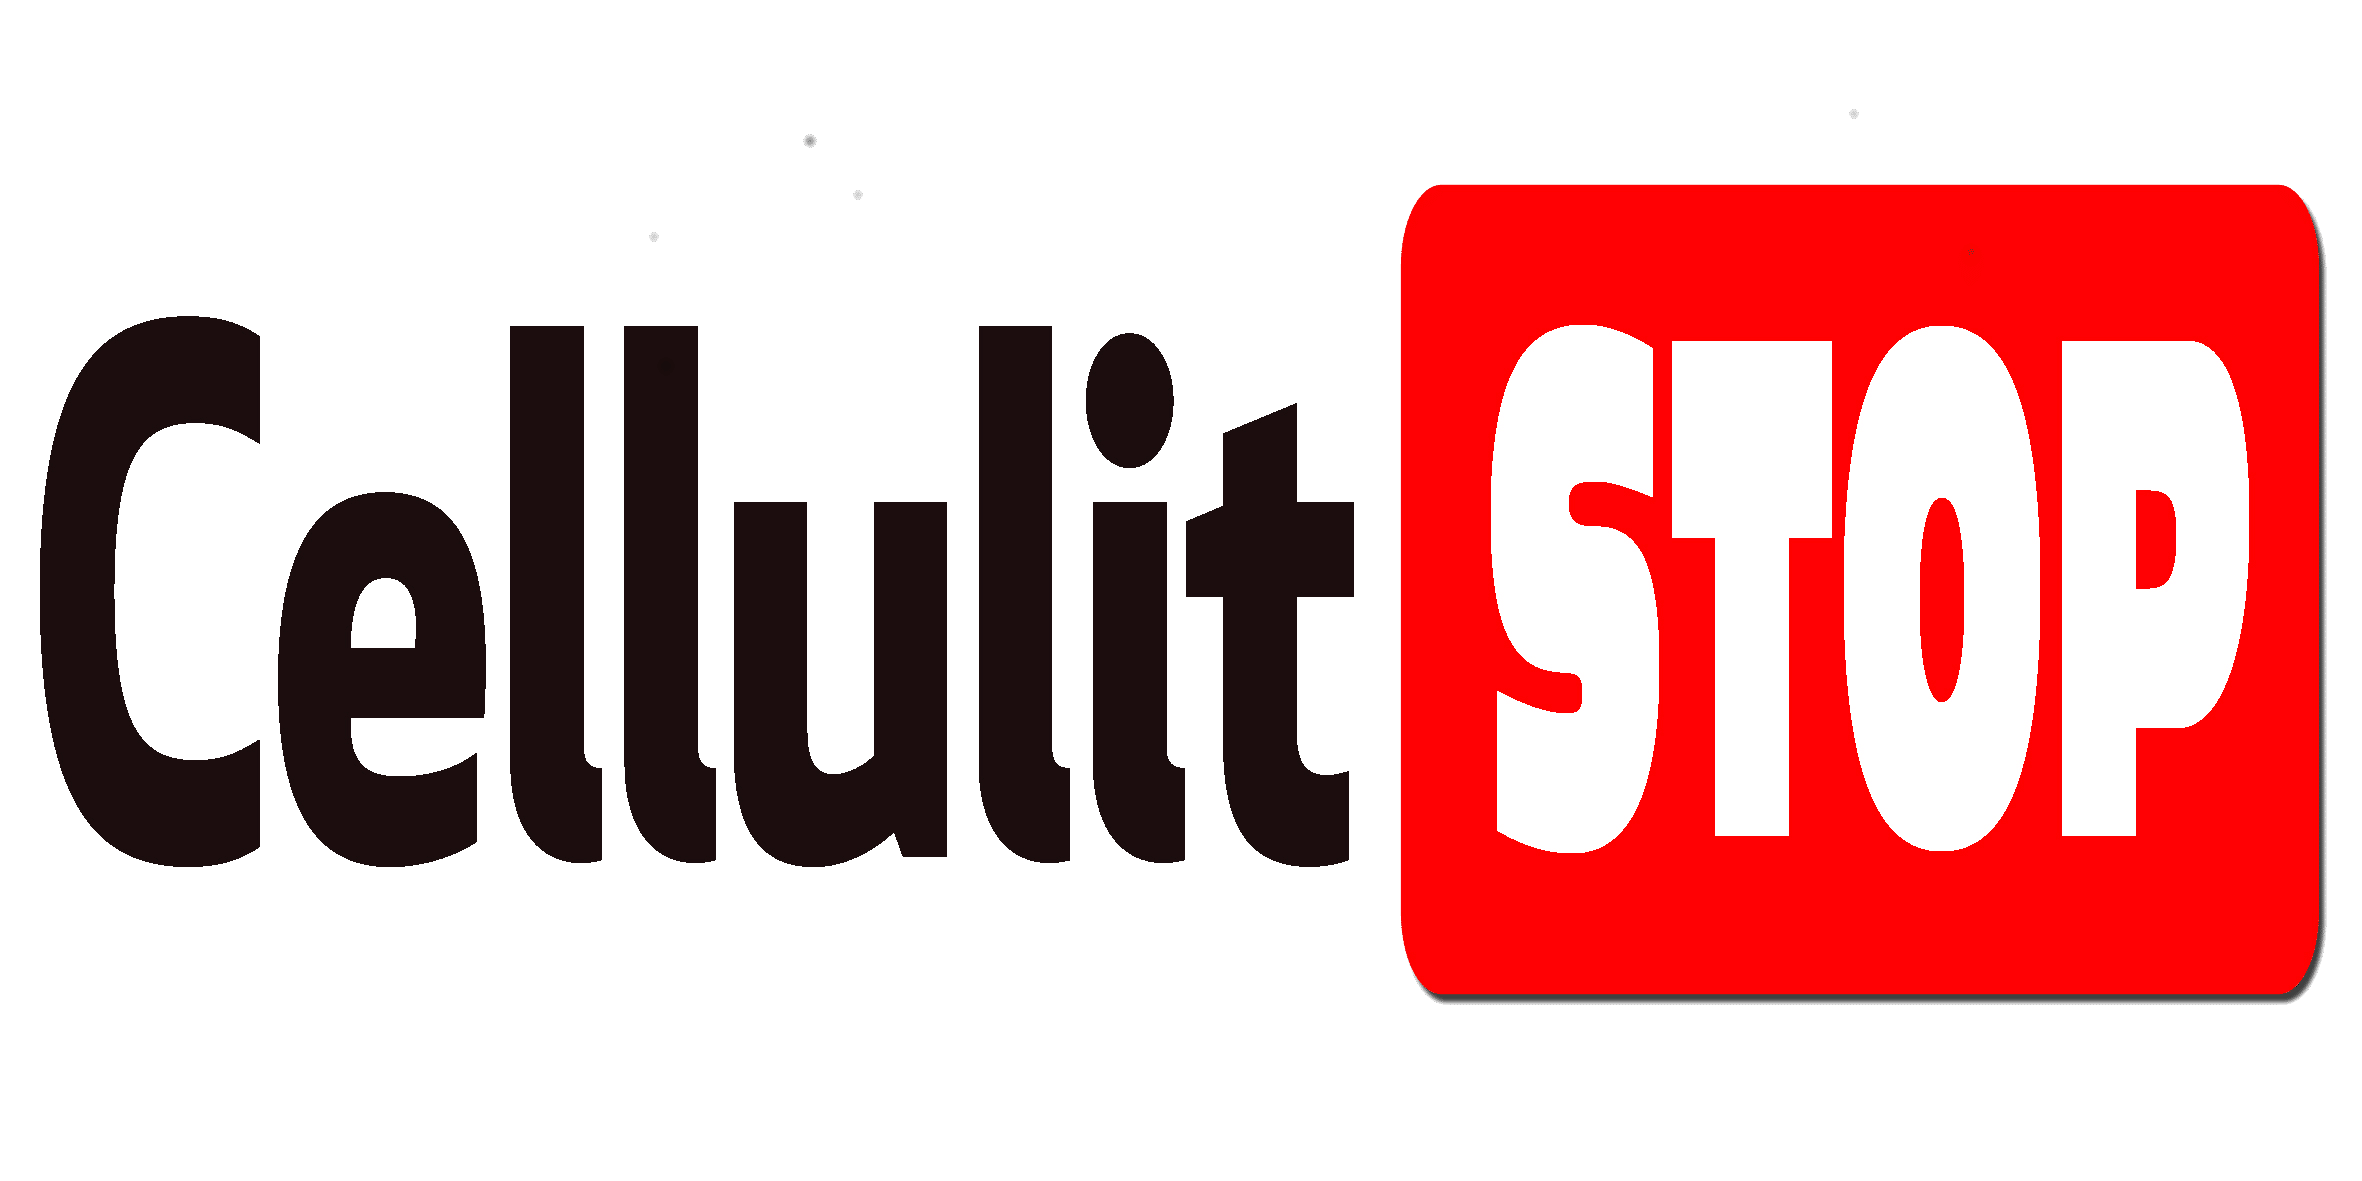 usuwanie-cellulitu-gdansk (2)